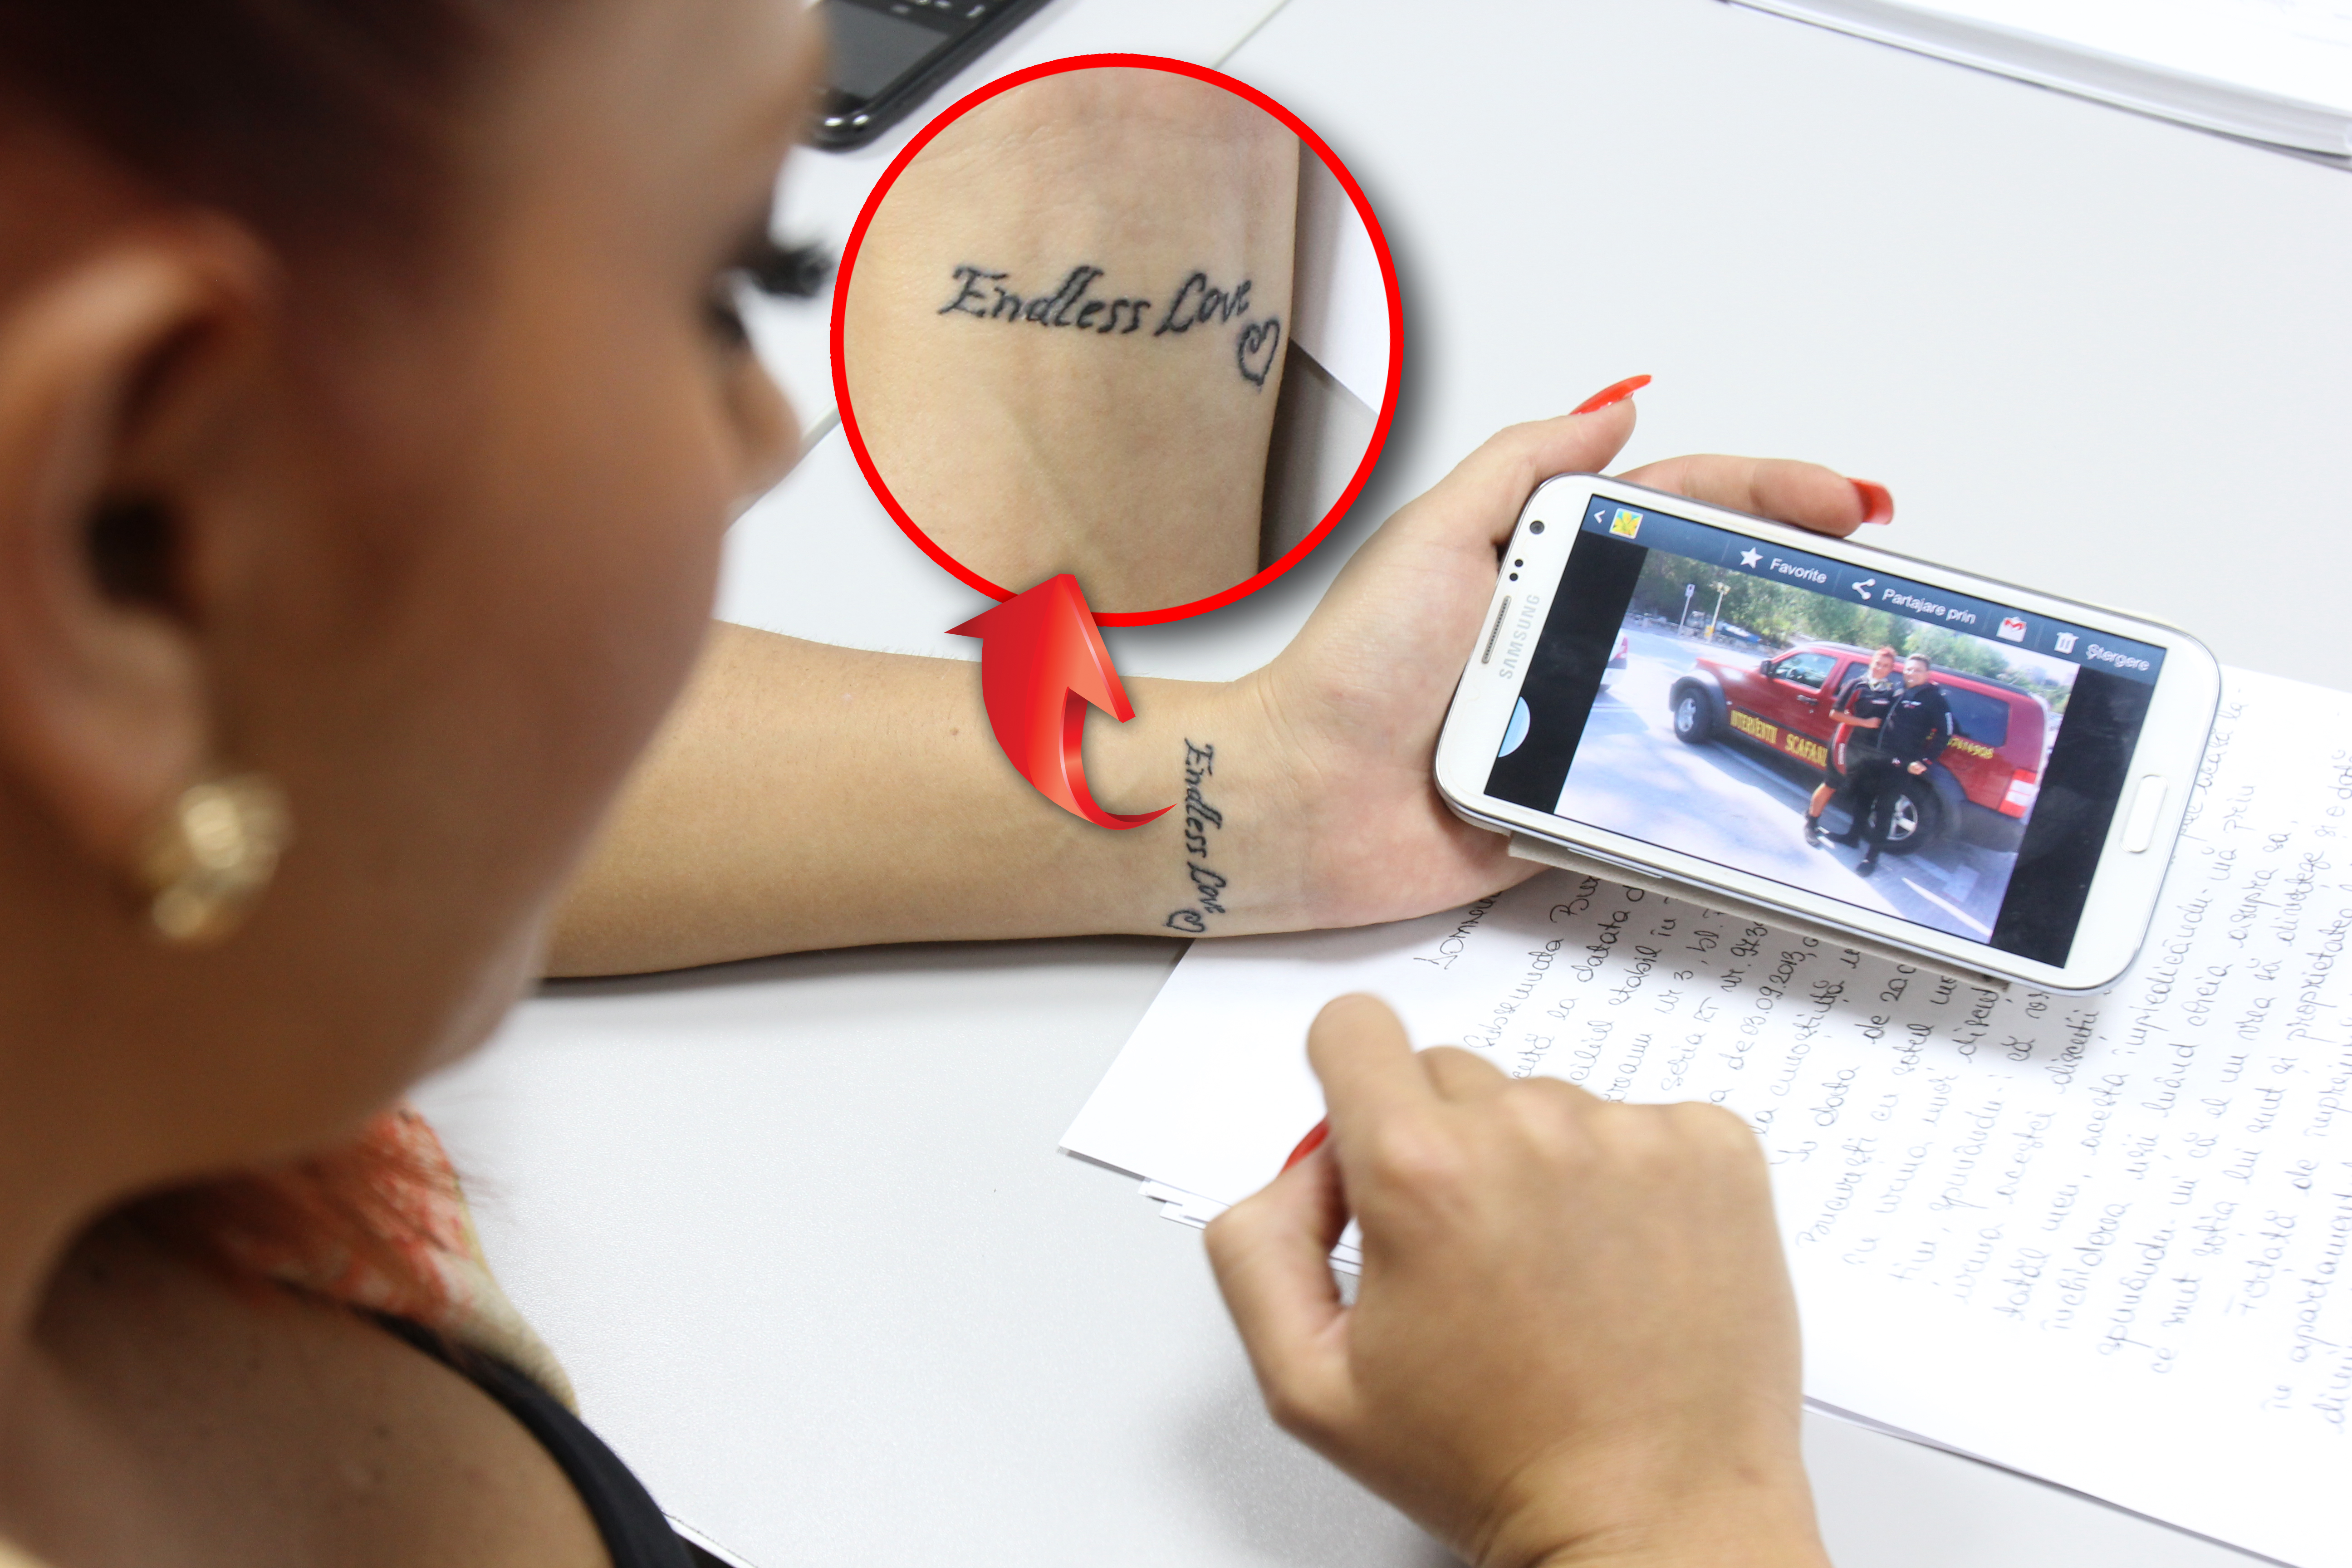 Ana Maria si-a tatuat pe mana